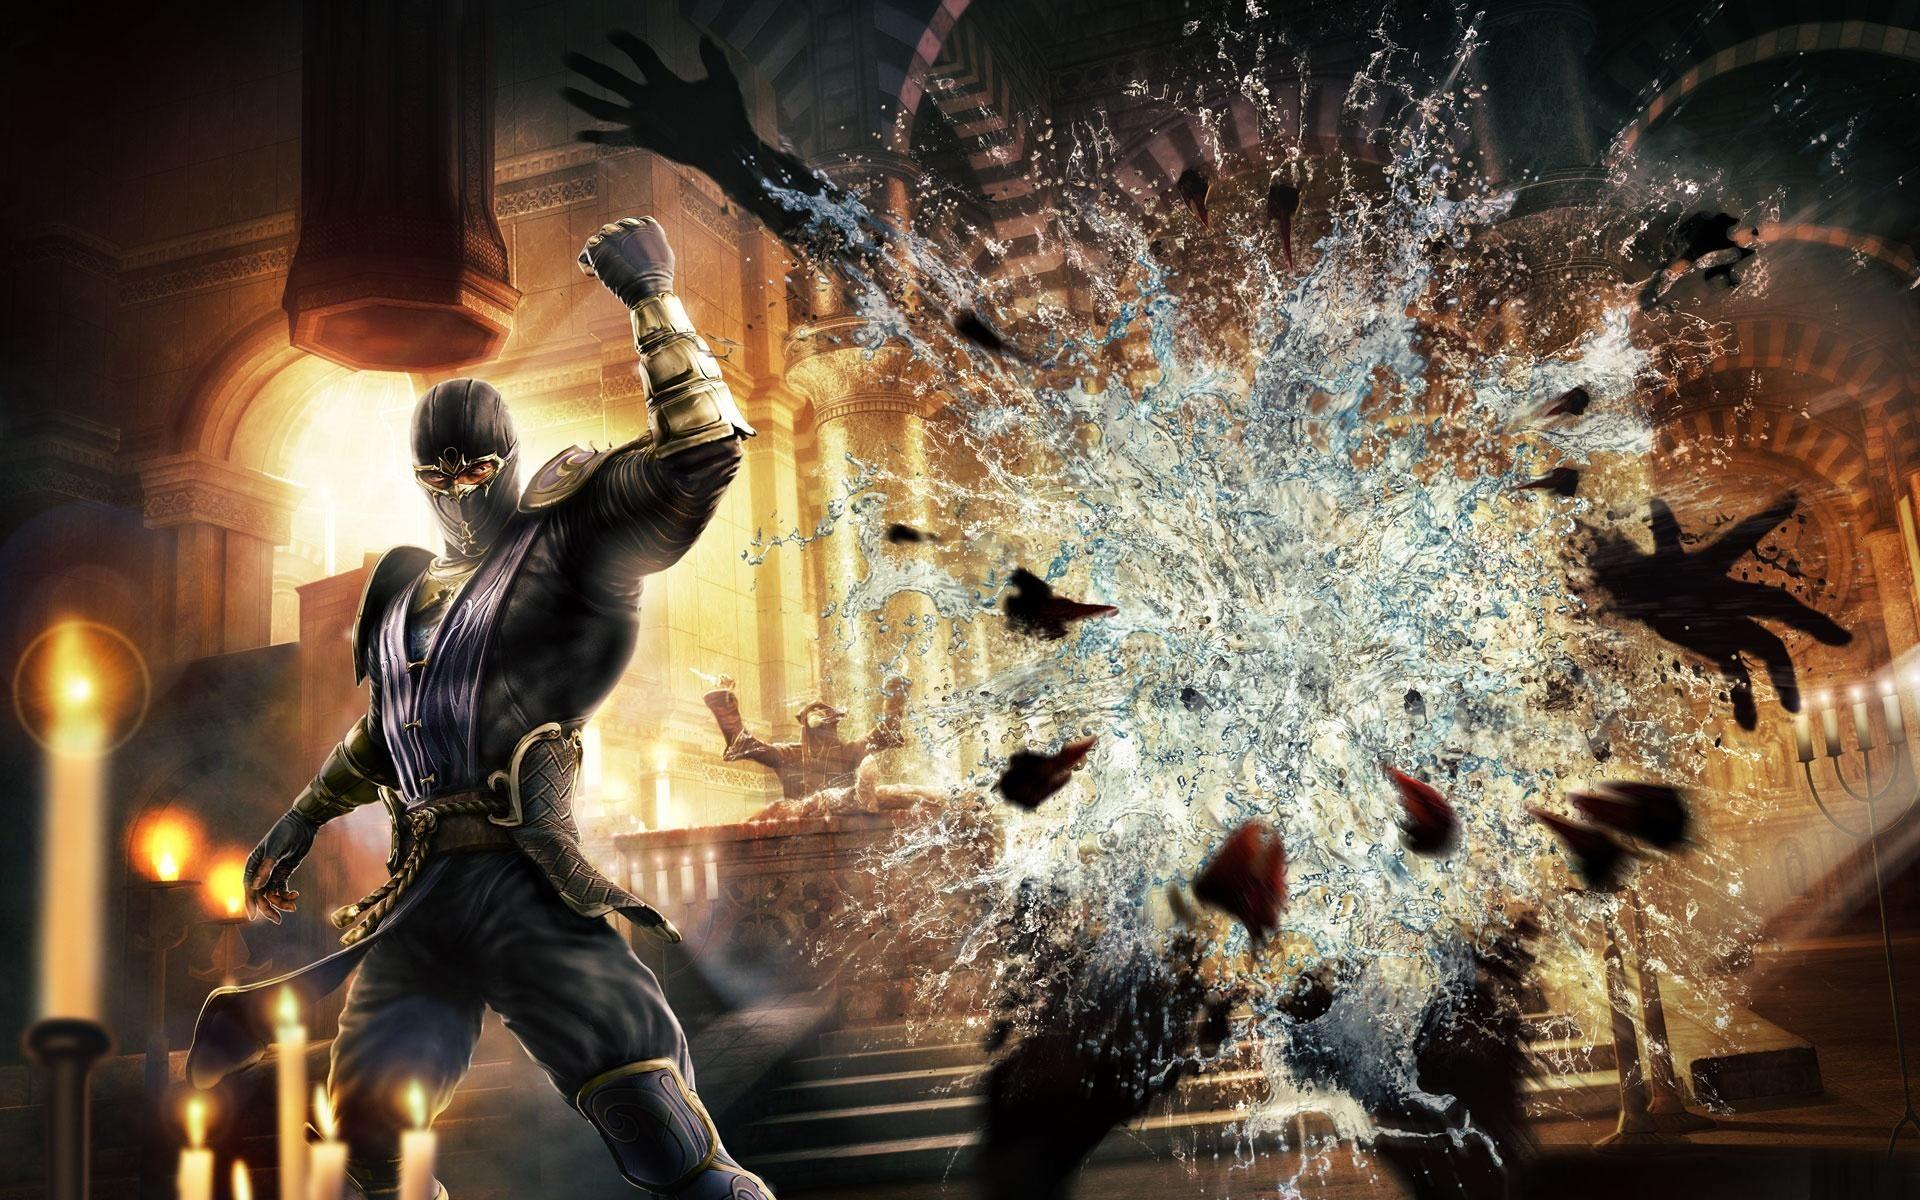 Mortal Kombat Fatality HD Wallpaper | 999HDWallpaper